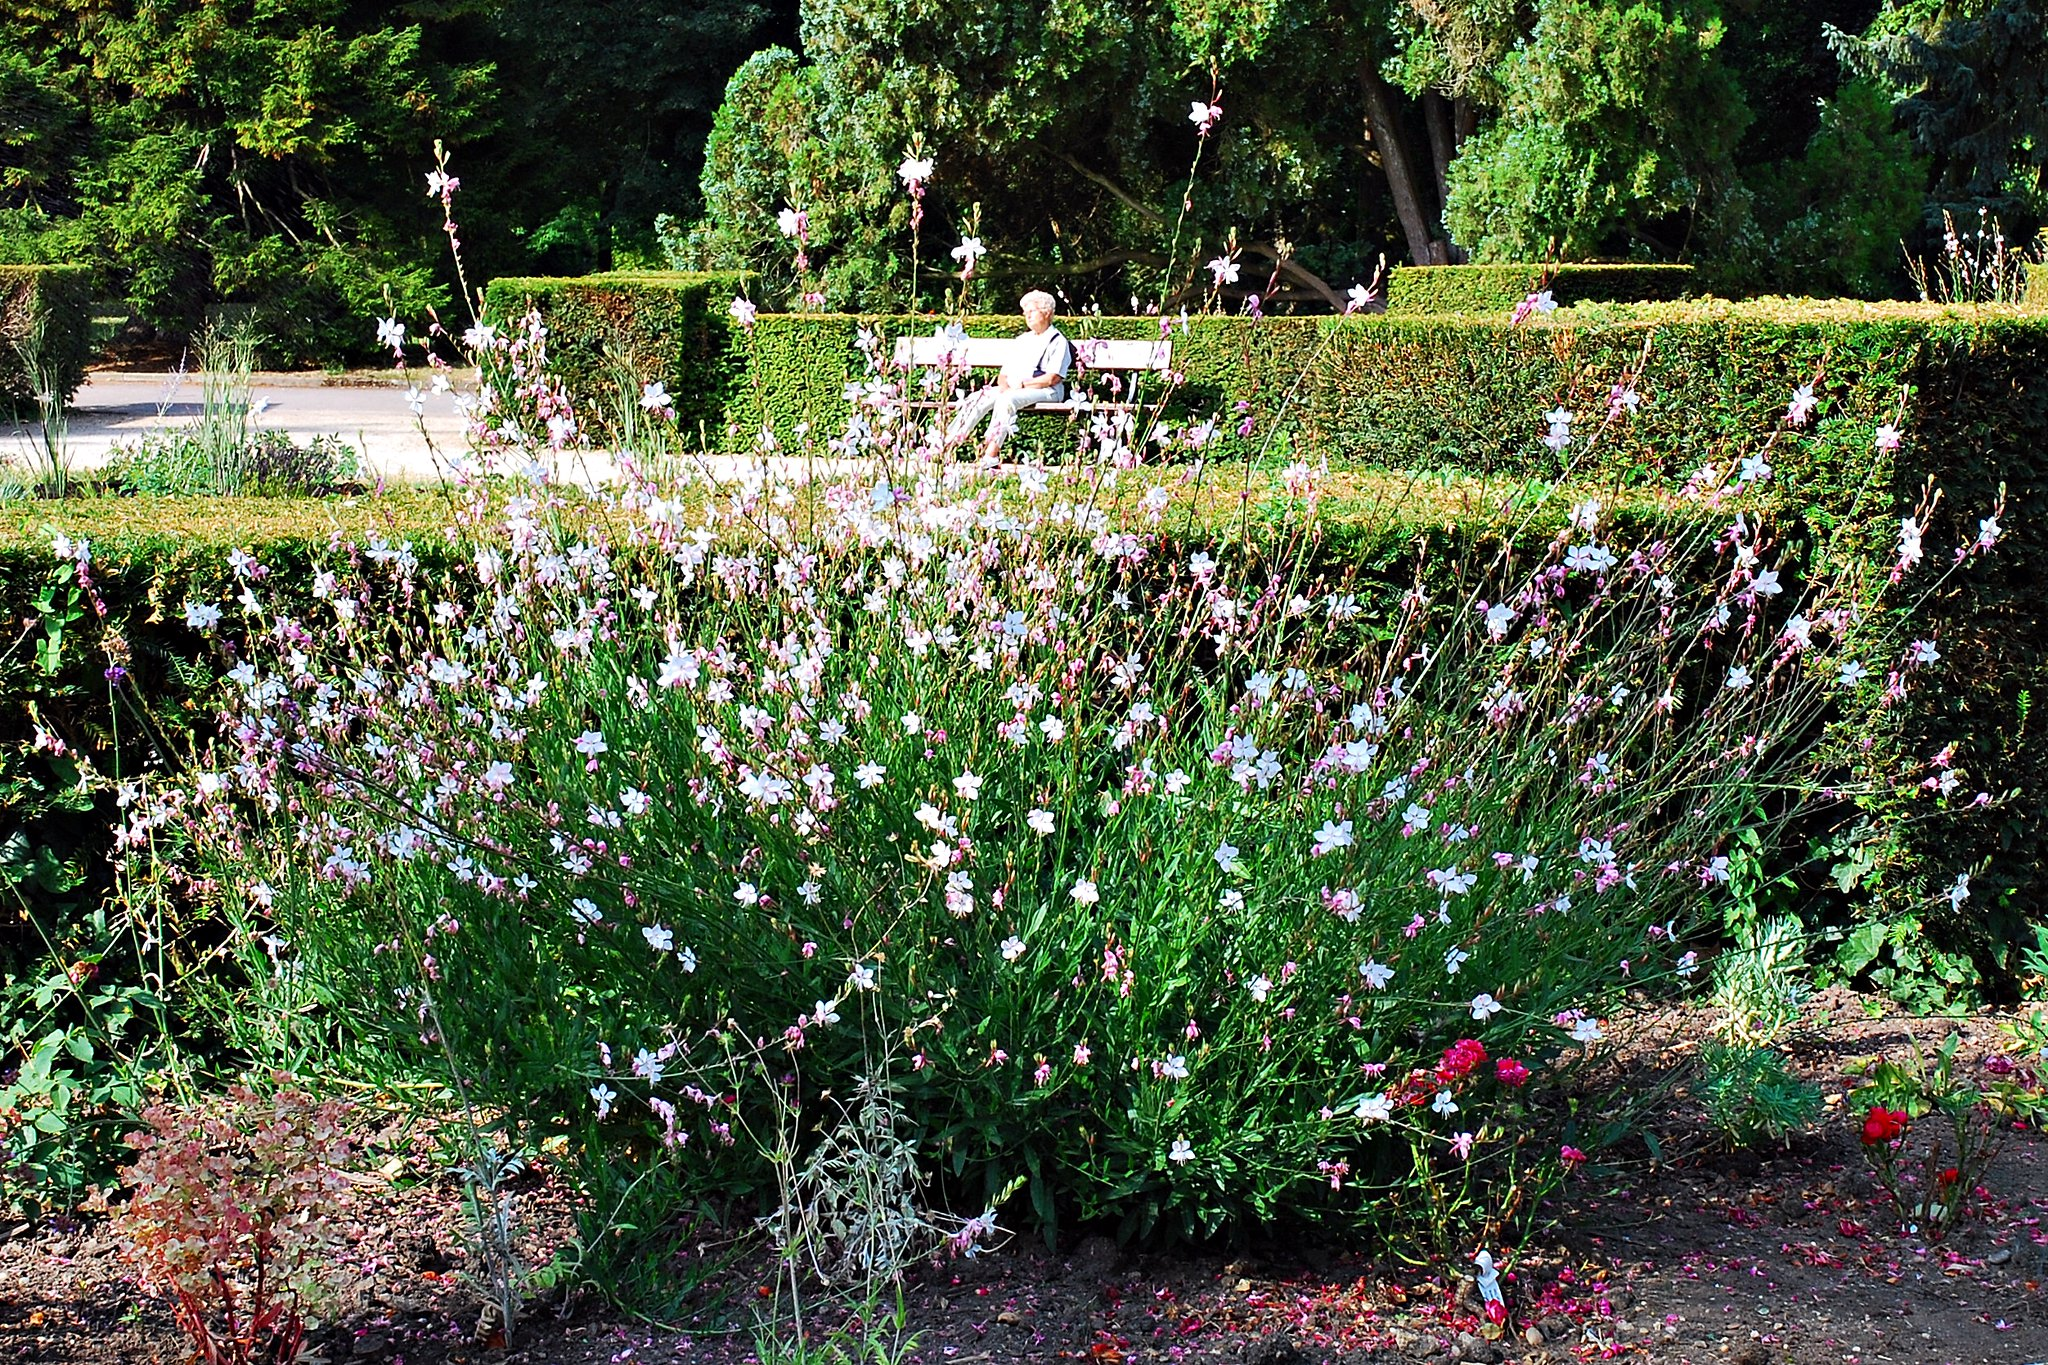 Back to photostream for Jardin botanique metz